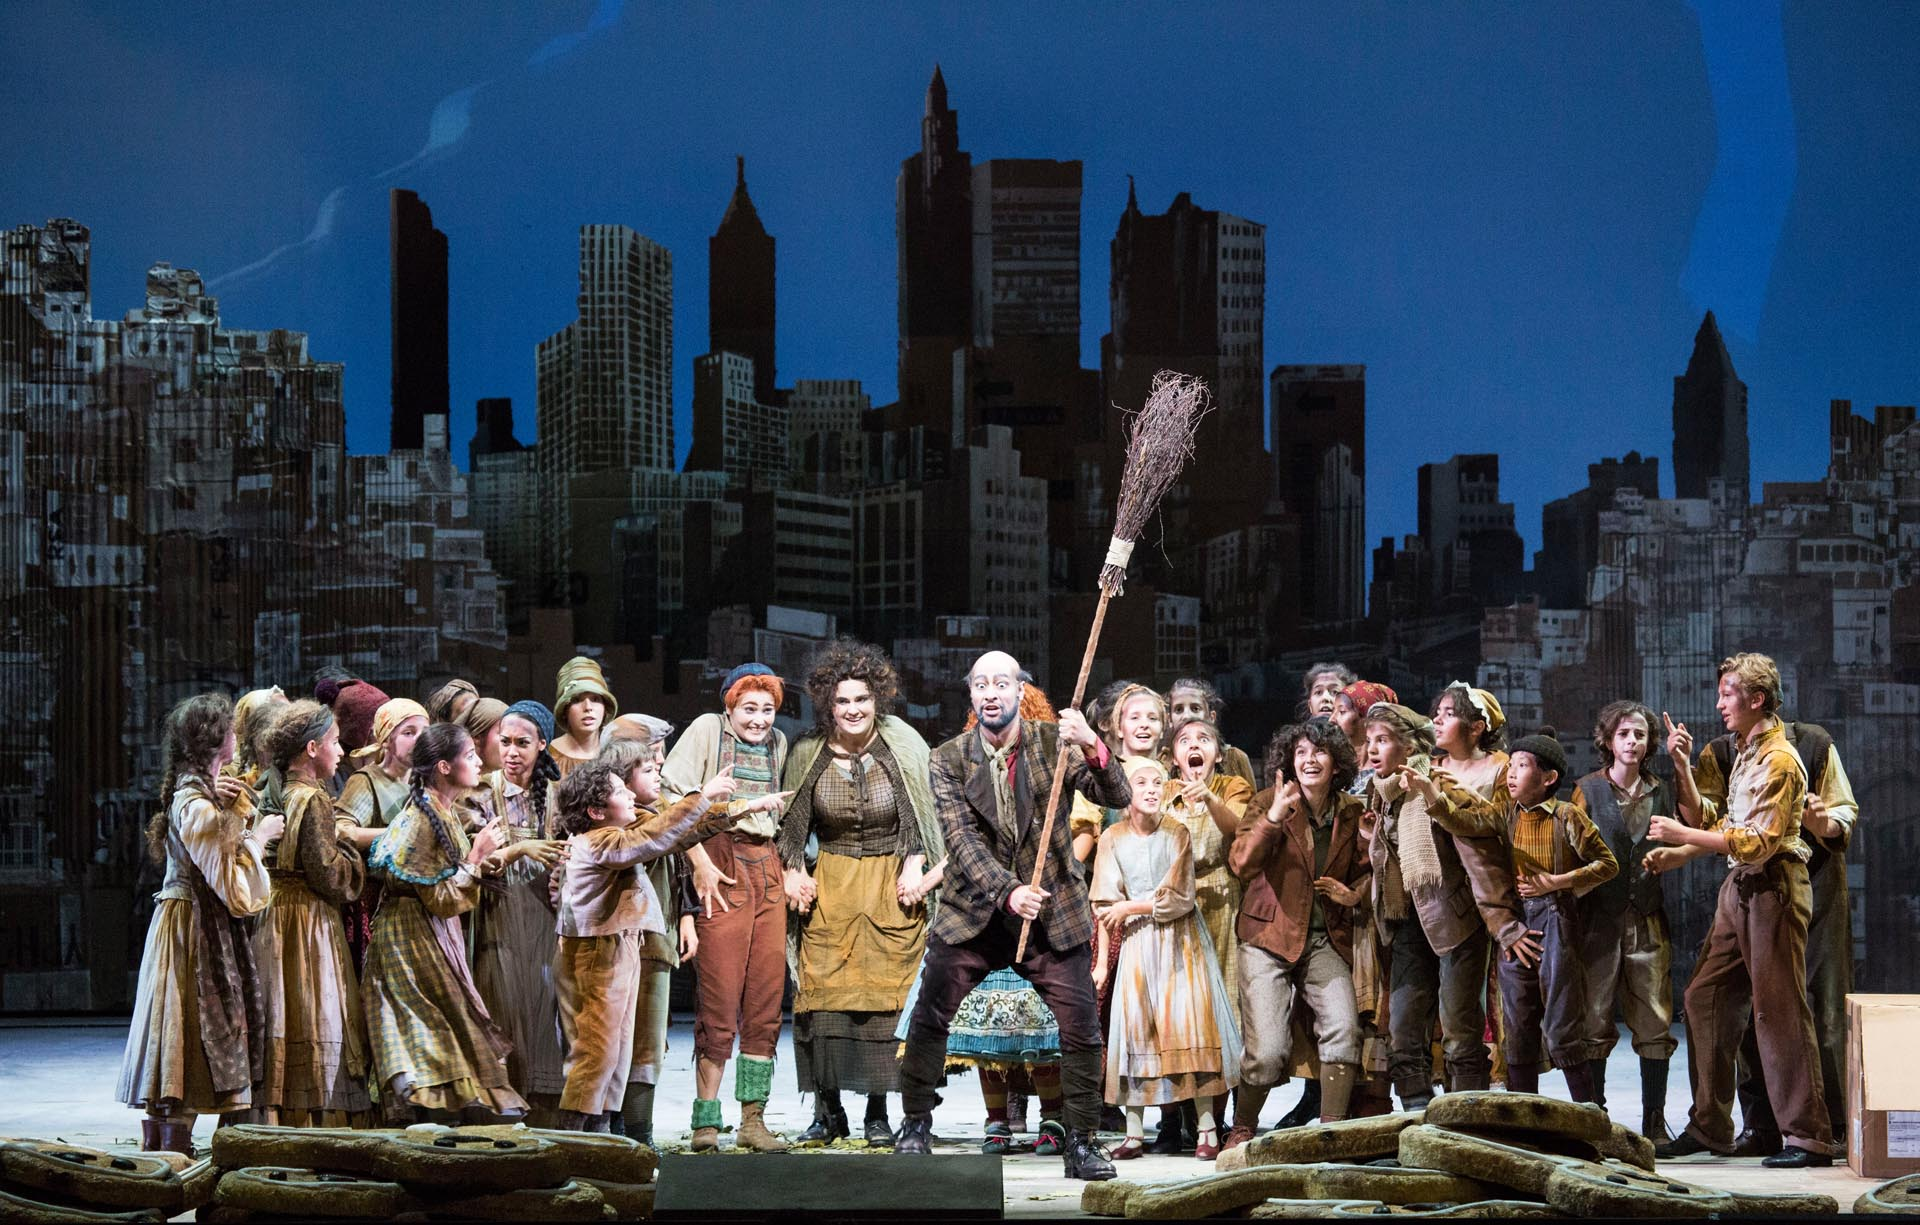 13 Hänsel und Gretel, Teatro alla Scala, 2017, © Brescia und Amisano